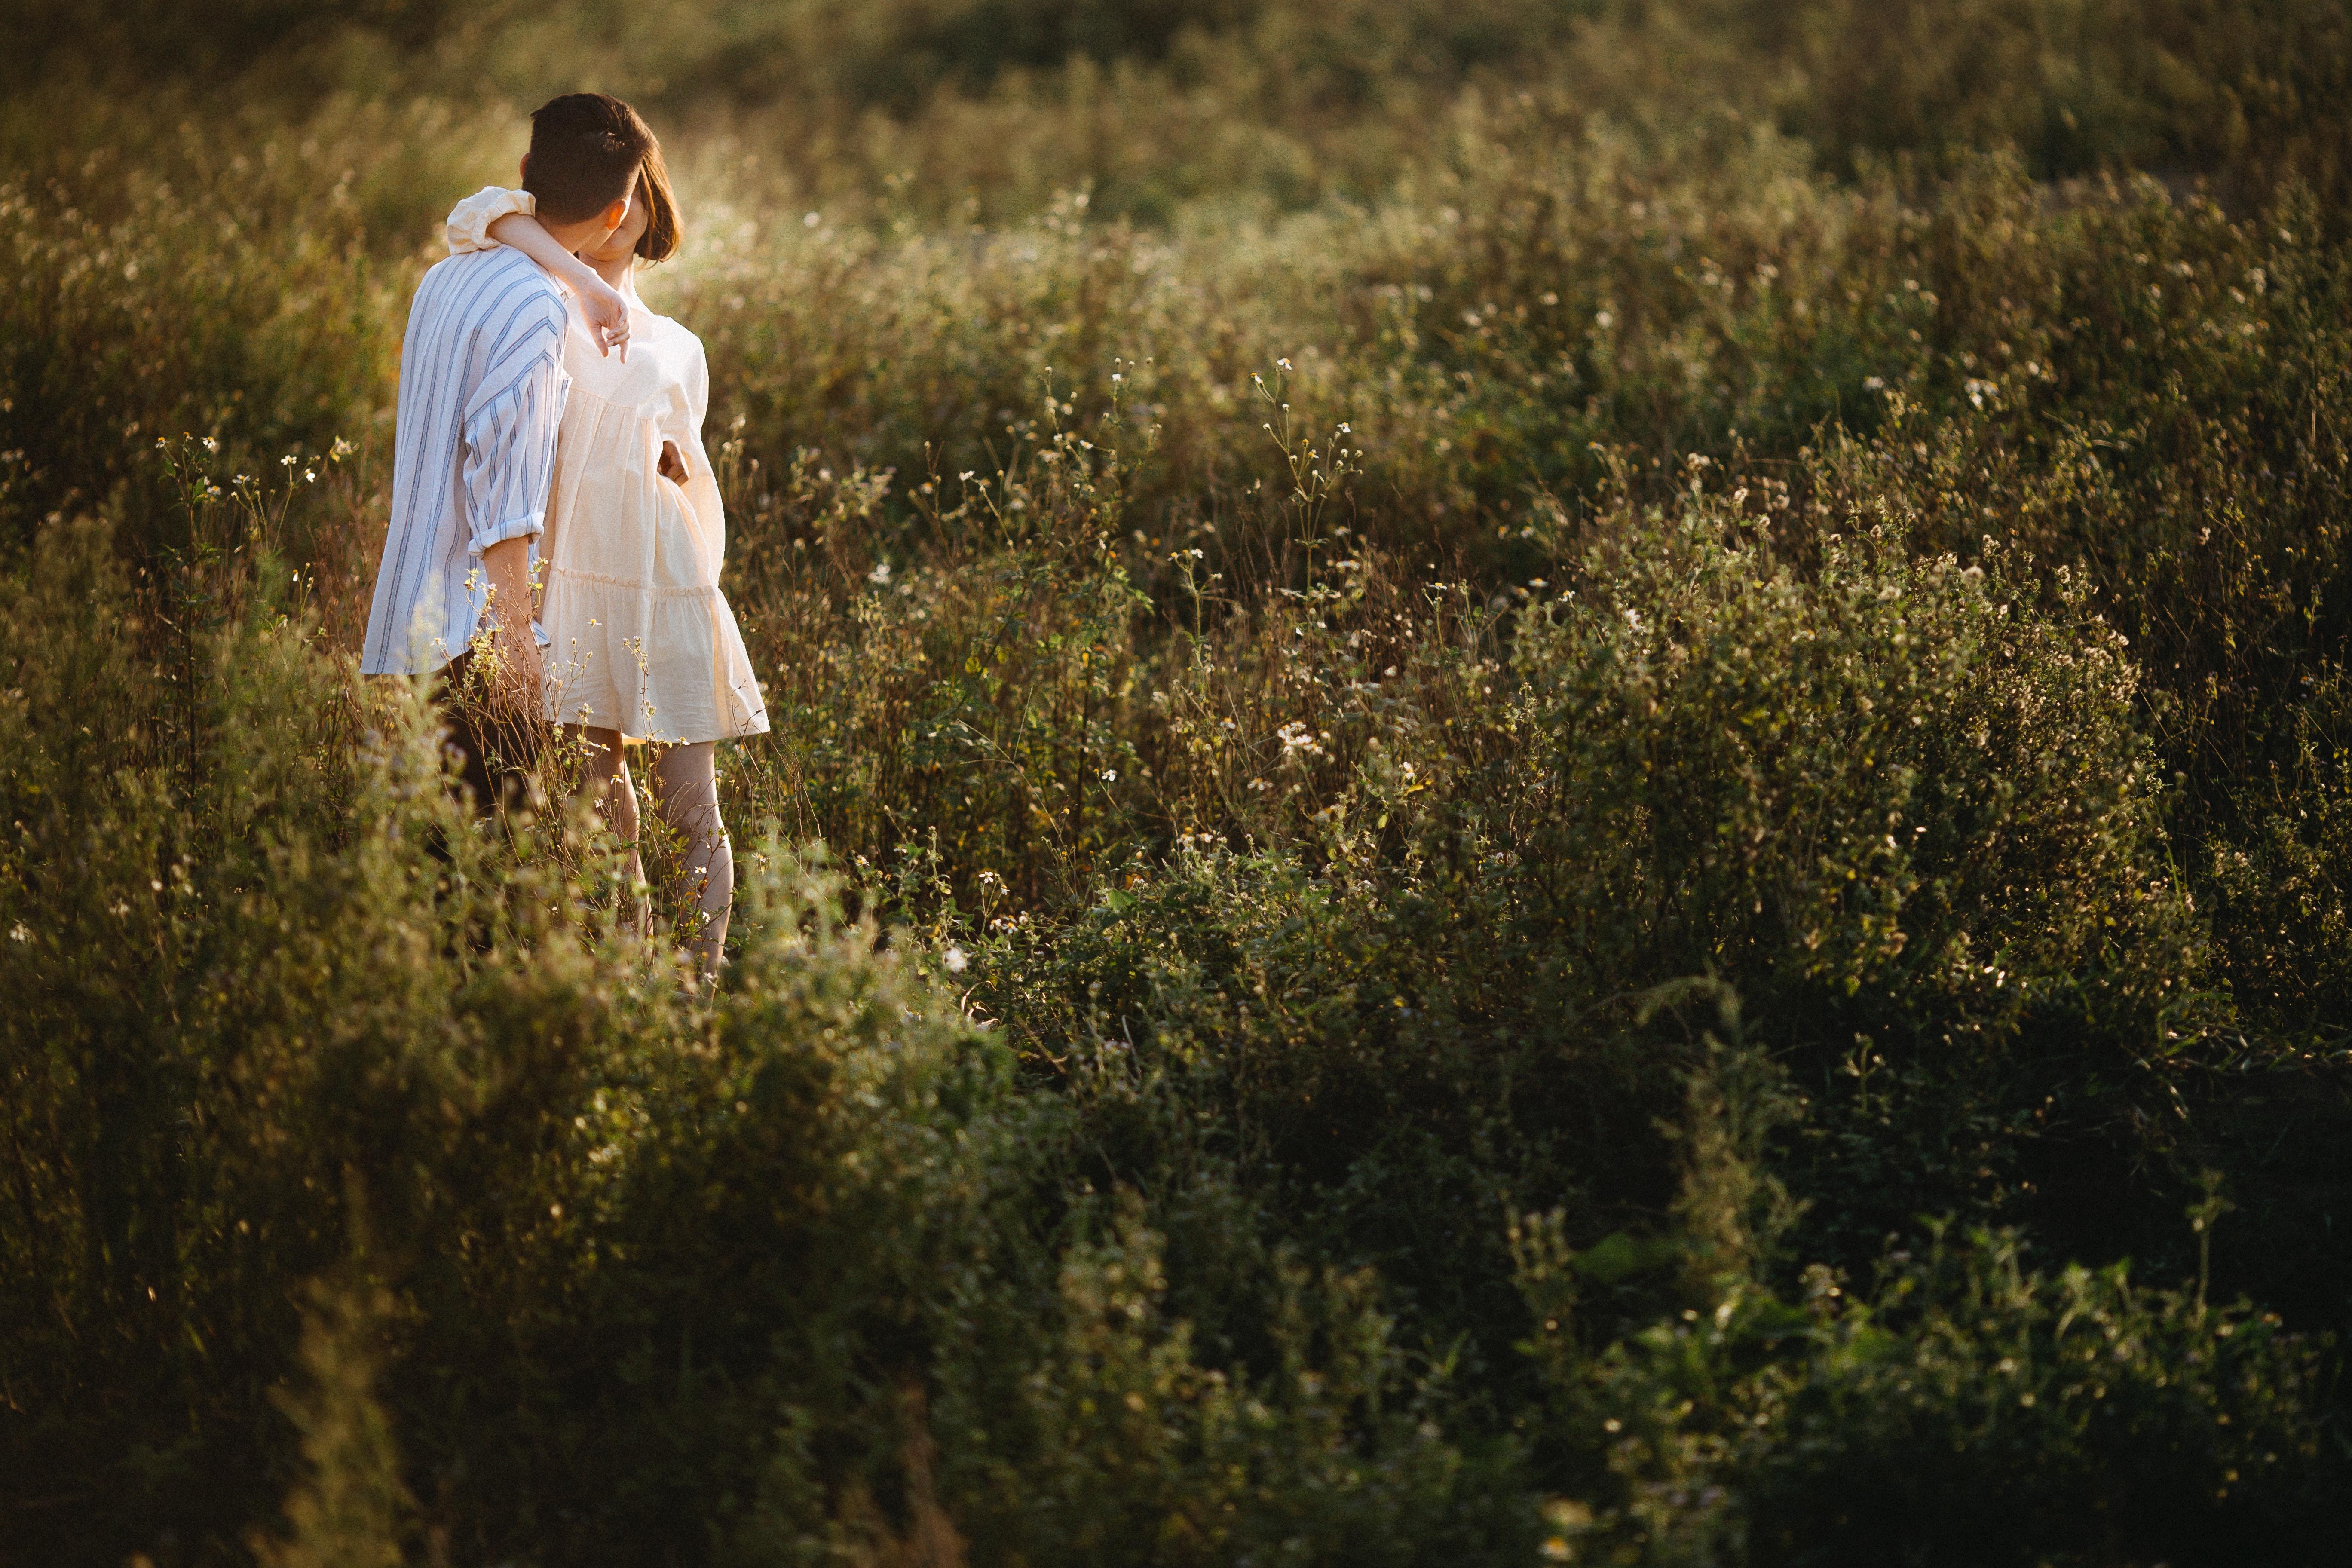 Free Images Adult Countryside Couple Daylight Fashion